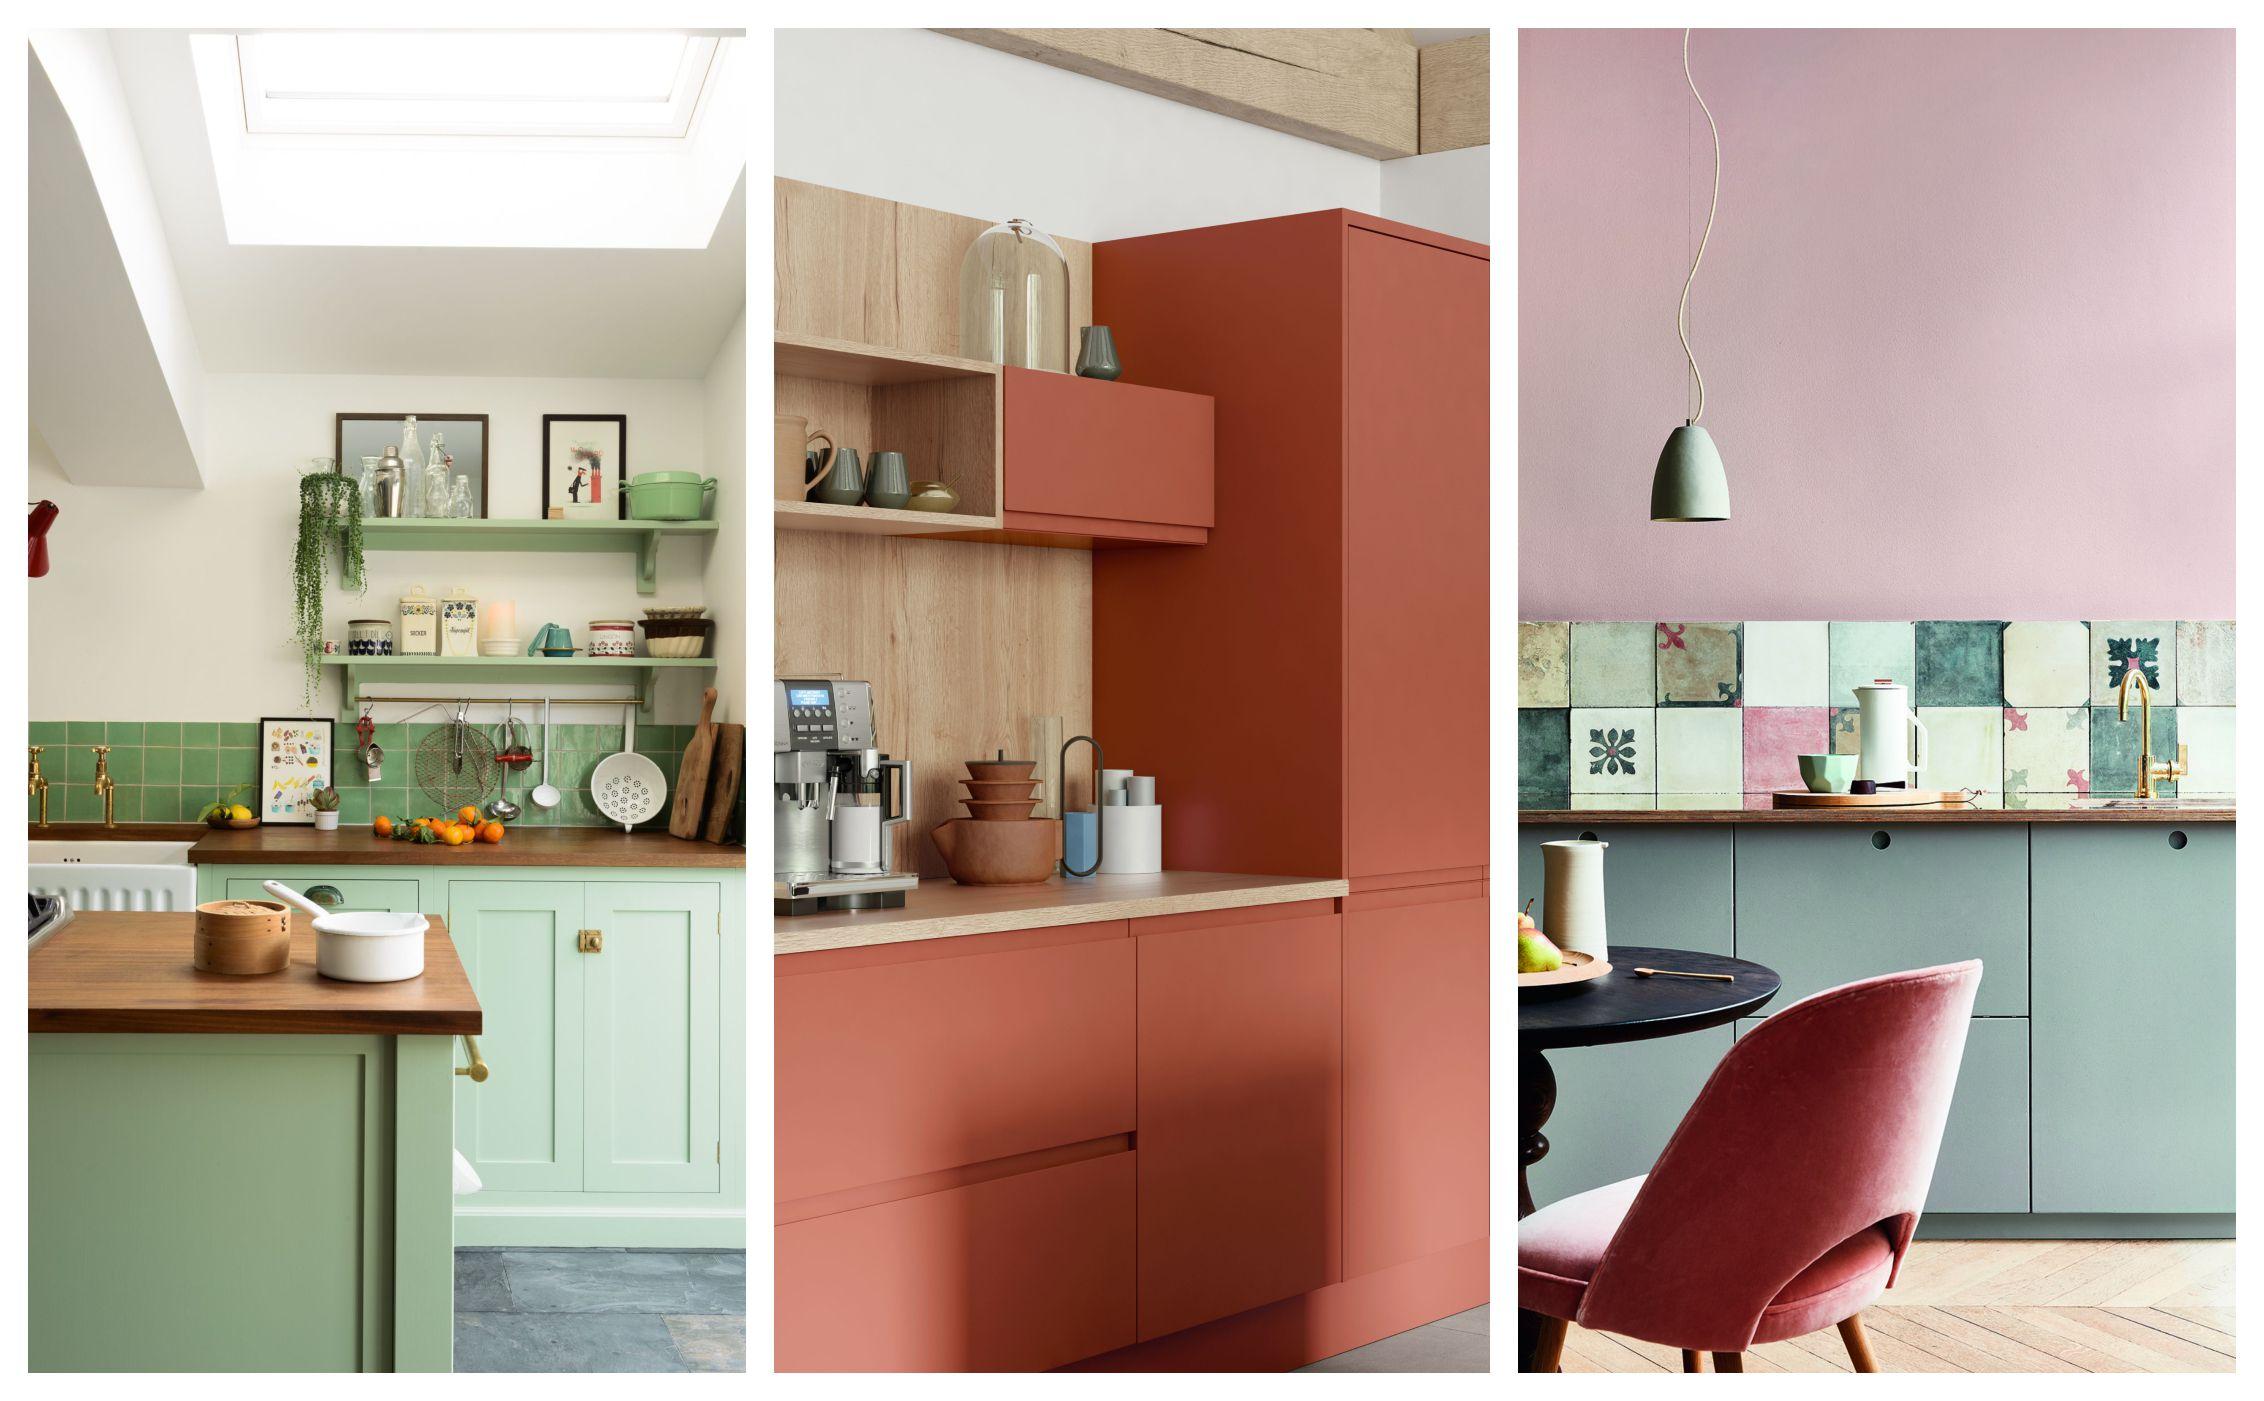 Best Modern Kitchen Colour Ideas - New Kitchen Paint Ideas